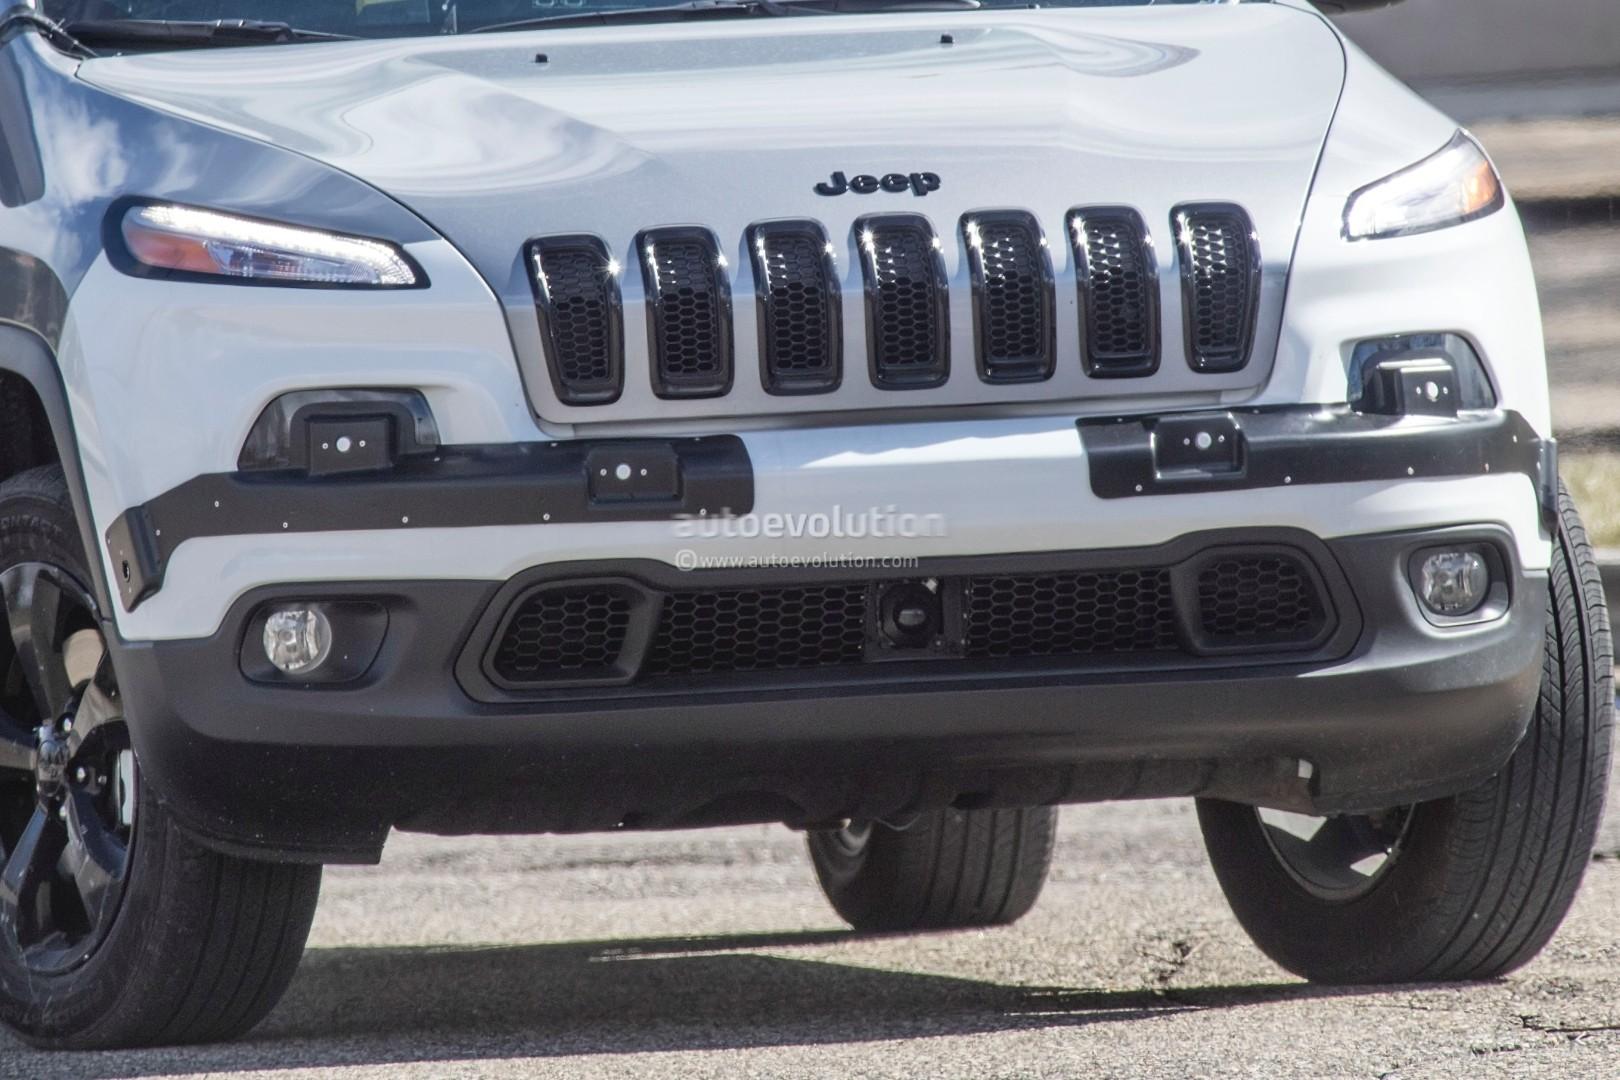 2018 Trackhawk Jeep >> 2018 Jeep Cherokee Prototype Hints at Single-Unit Headlights, Trackhawk Rumored - autoevolution